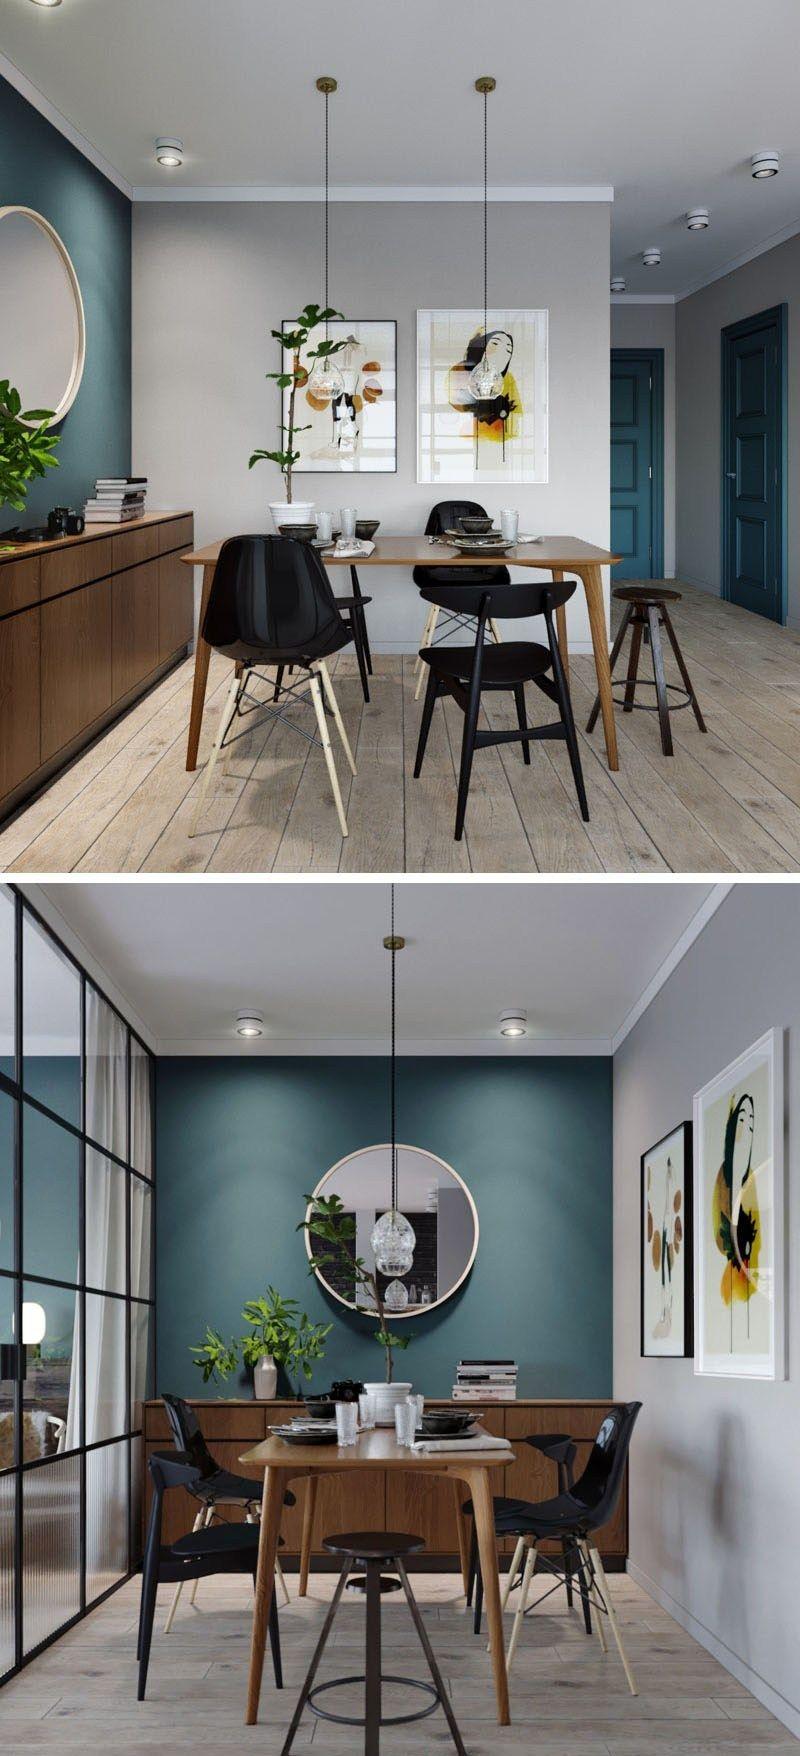 Mur bleu canard et style loft - Blog Déco - Clem Around The Corner